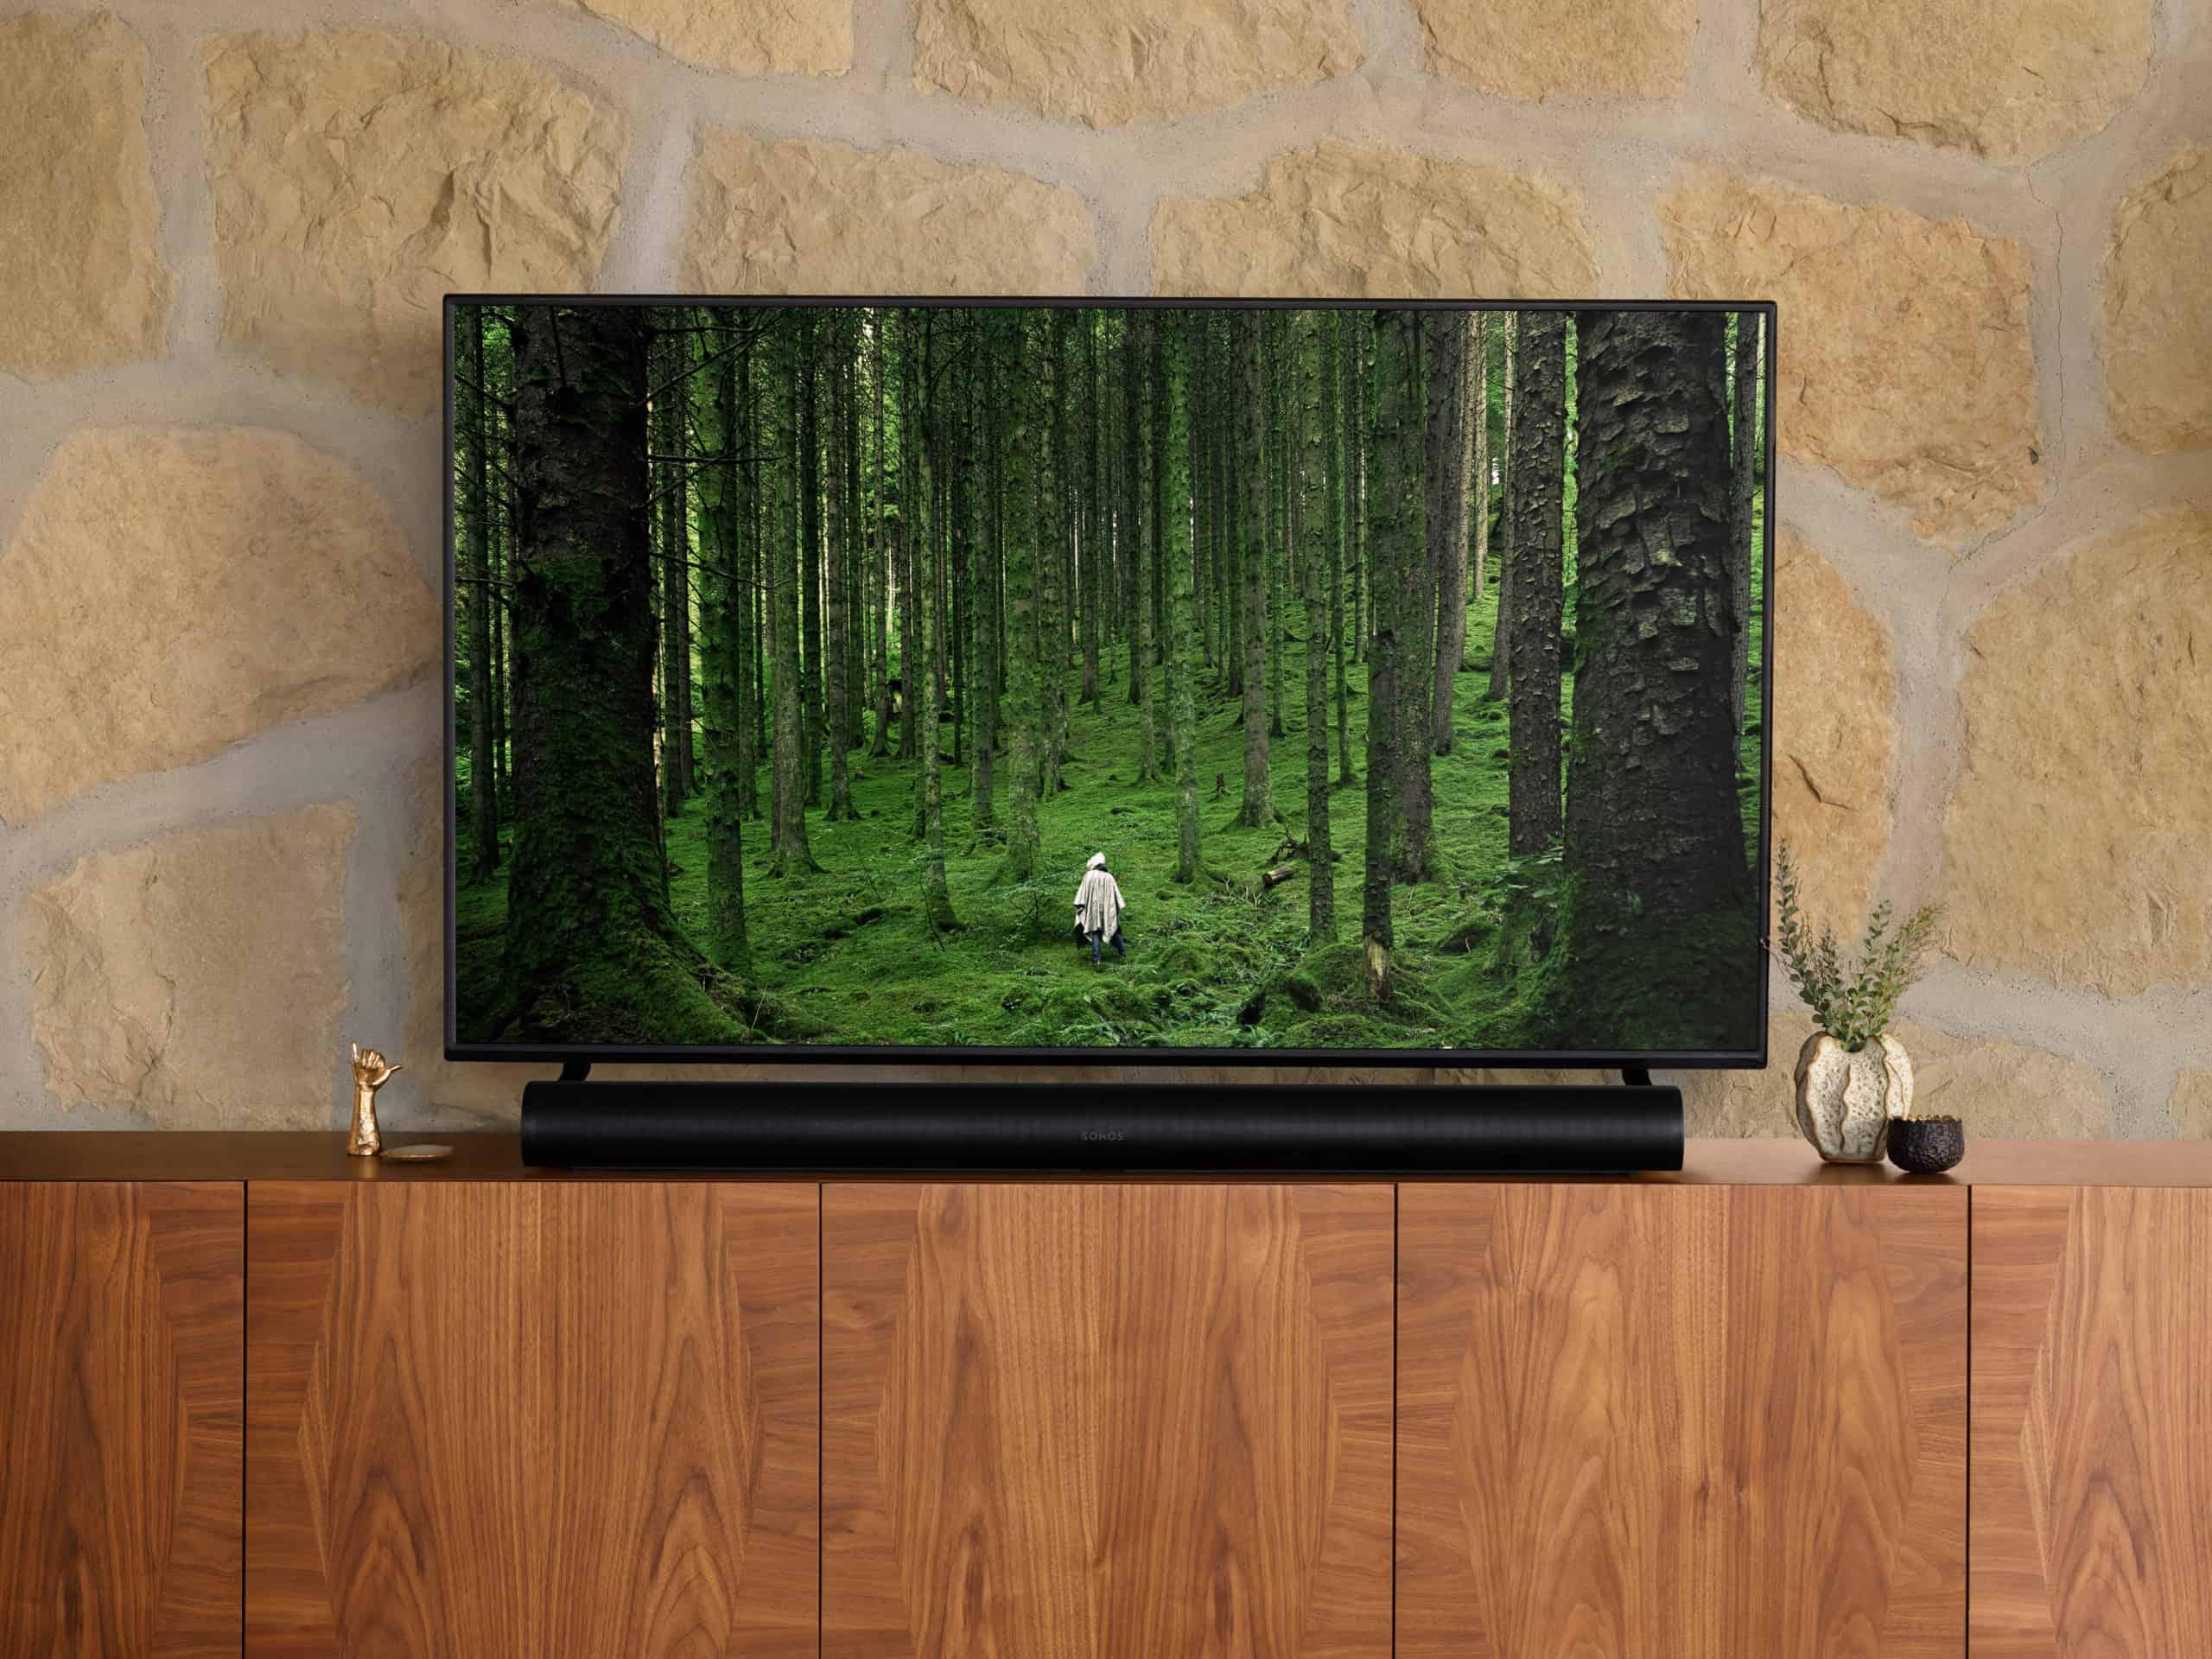 SonosArcWithStandingTV